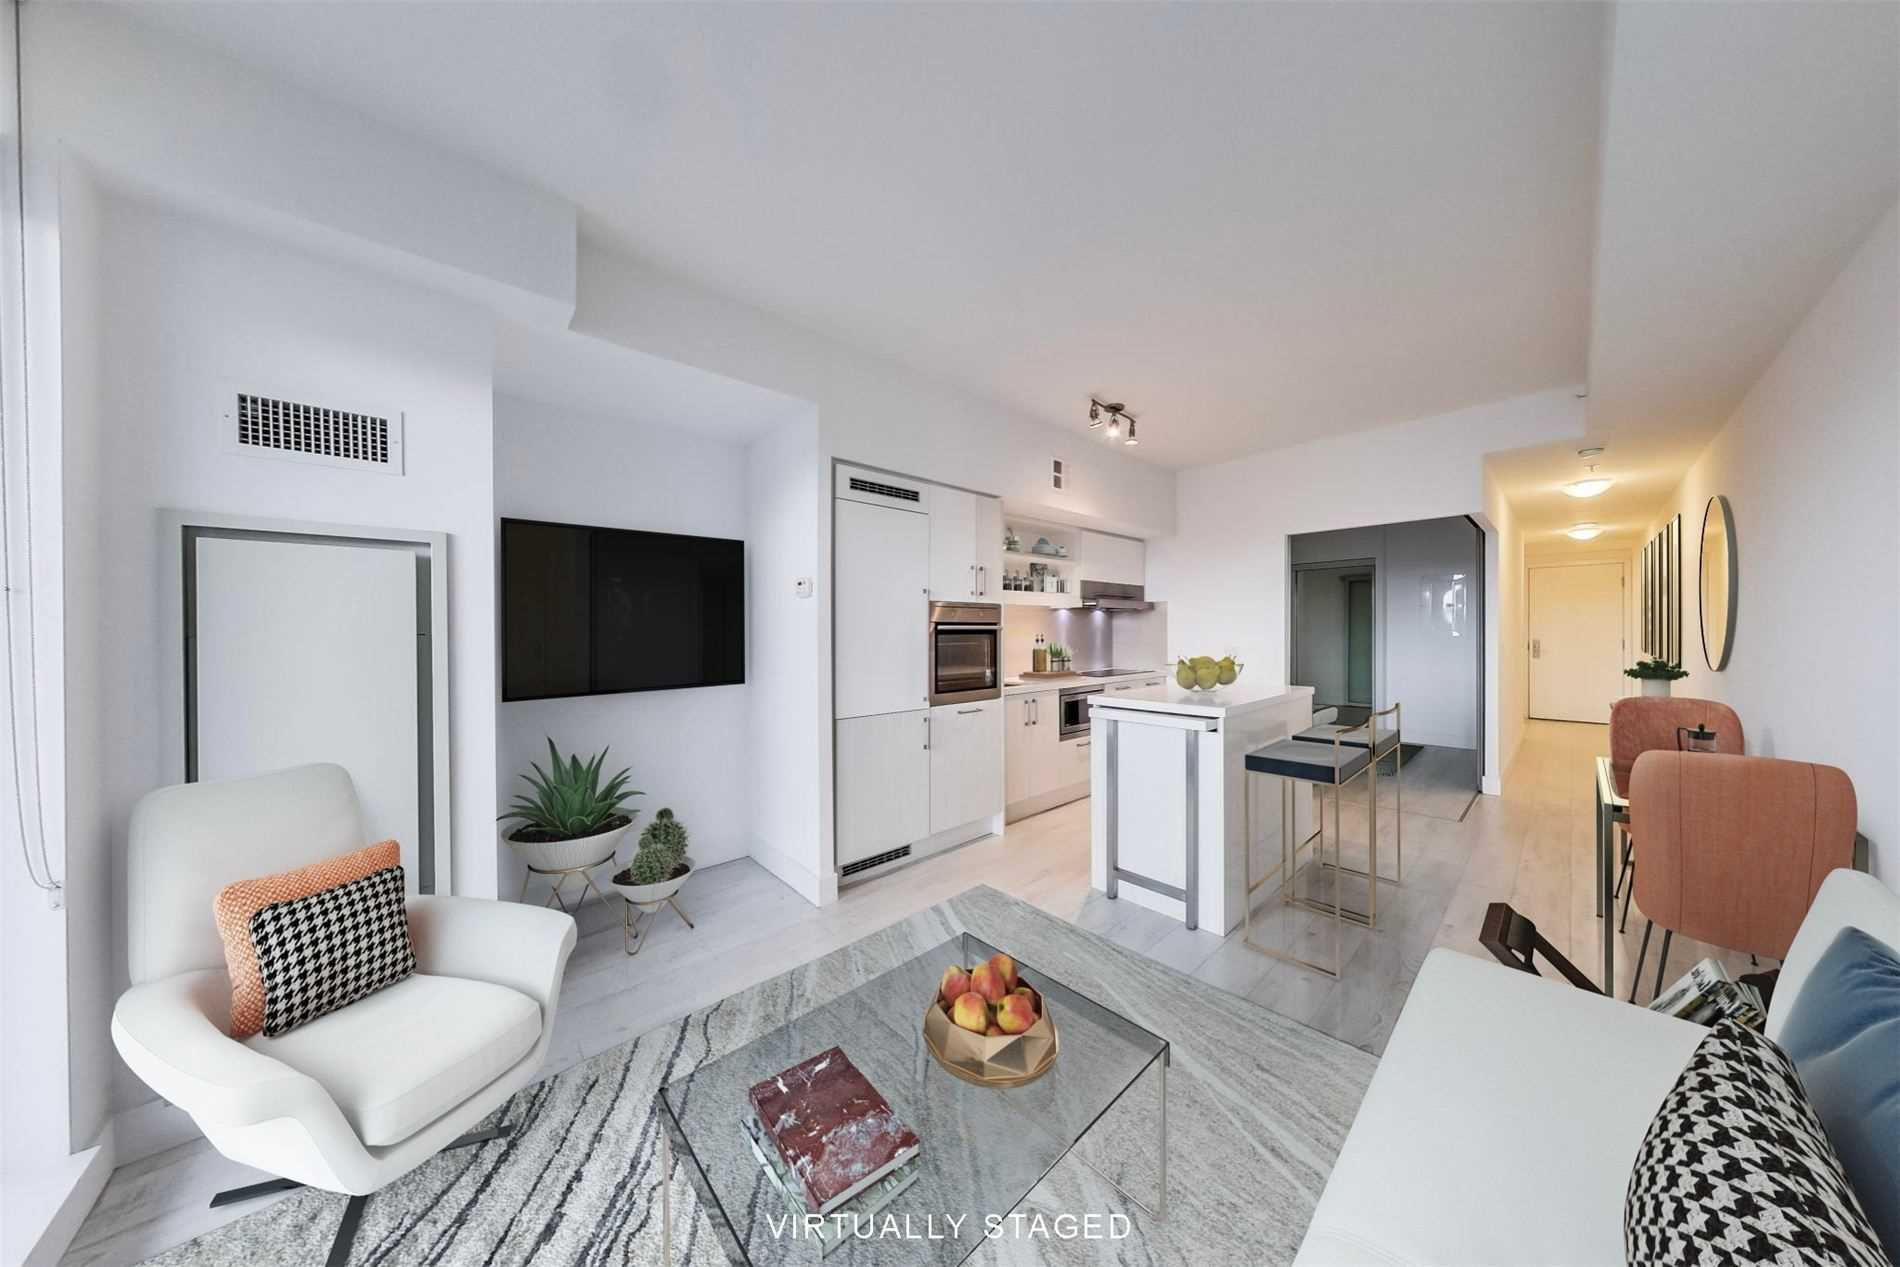 39 Sherbourne St, Toronto, Ontario M5A0L8, 1 Bedroom Bedrooms, 4 Rooms Rooms,1 BathroomBathrooms,Condo Apt,For Sale,Sherbourne,C4880308